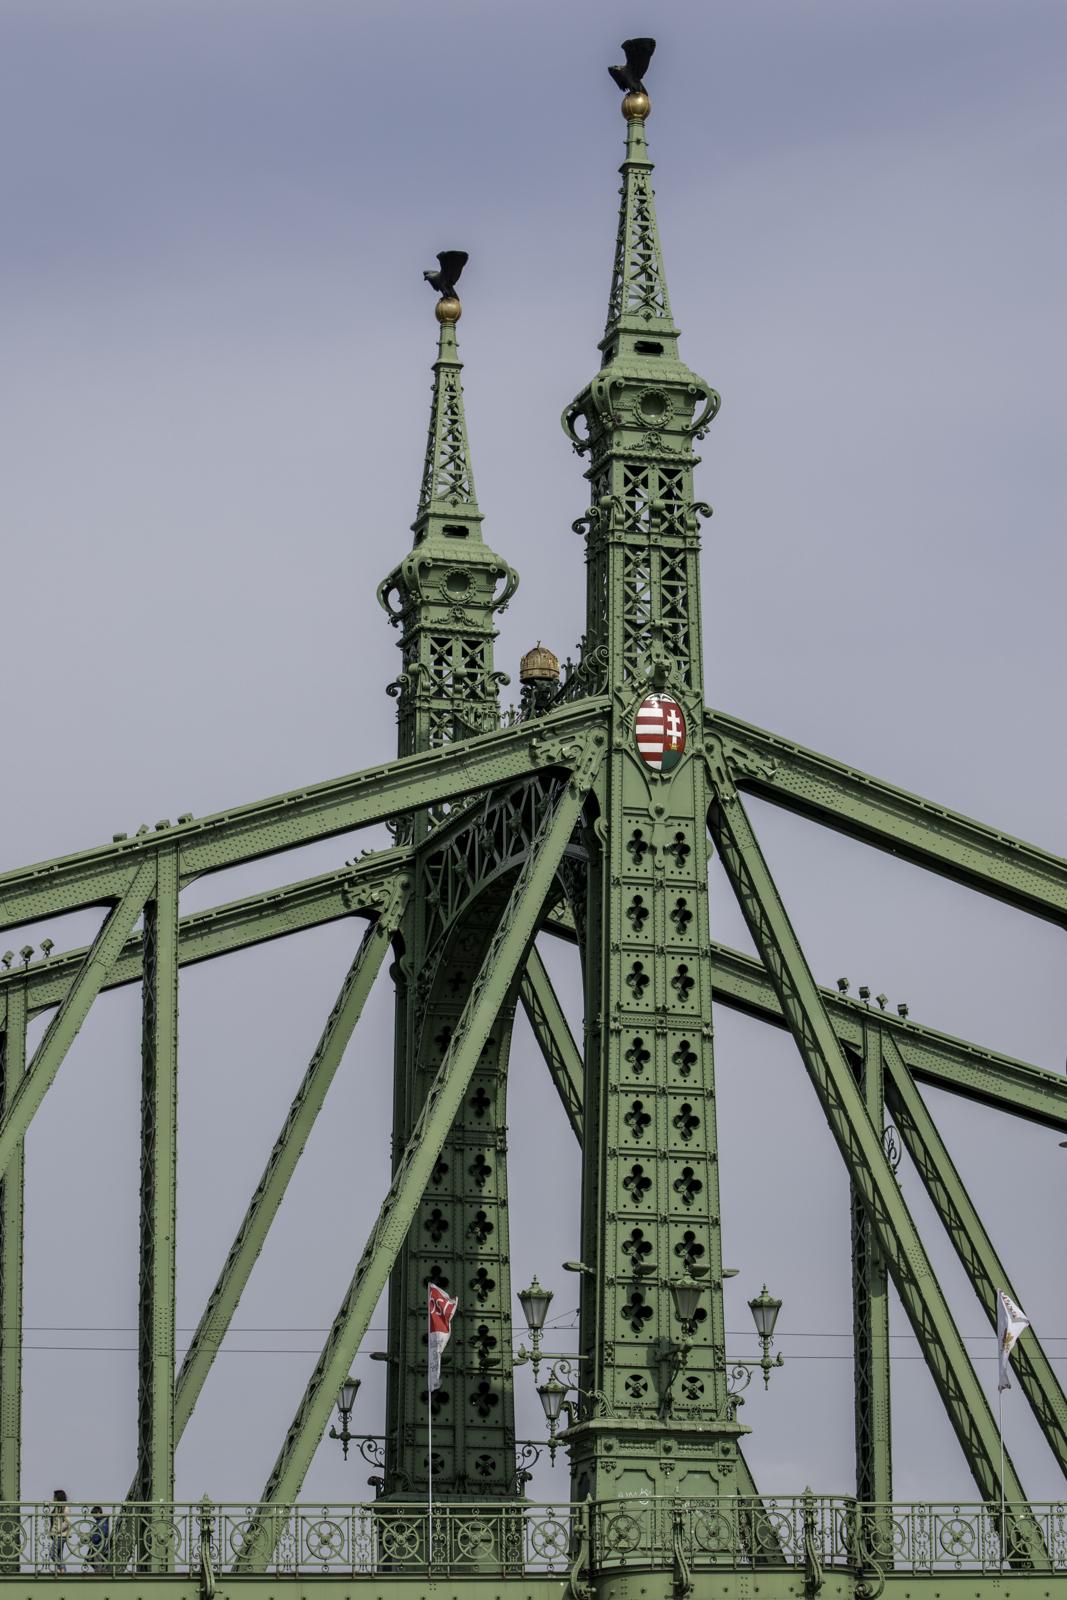 Details of the liberty bridge.